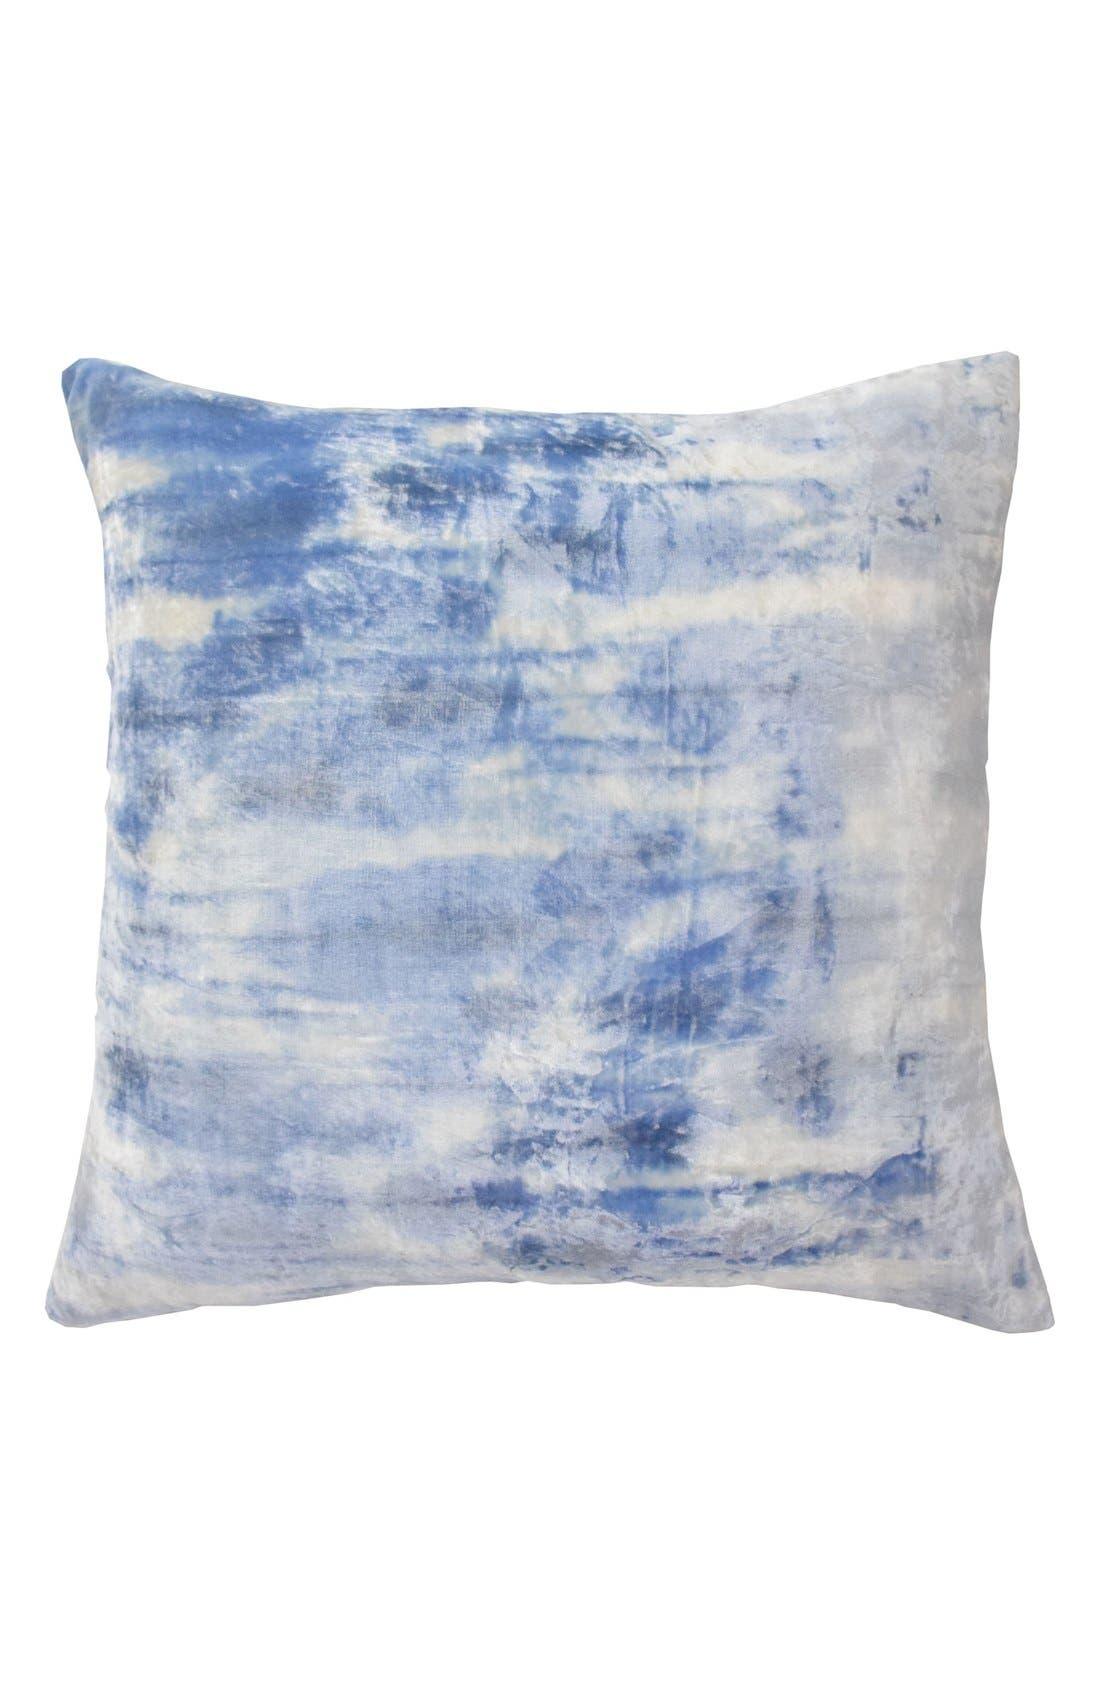 Main Image - Blissliving Home 'Cielo' Pillow